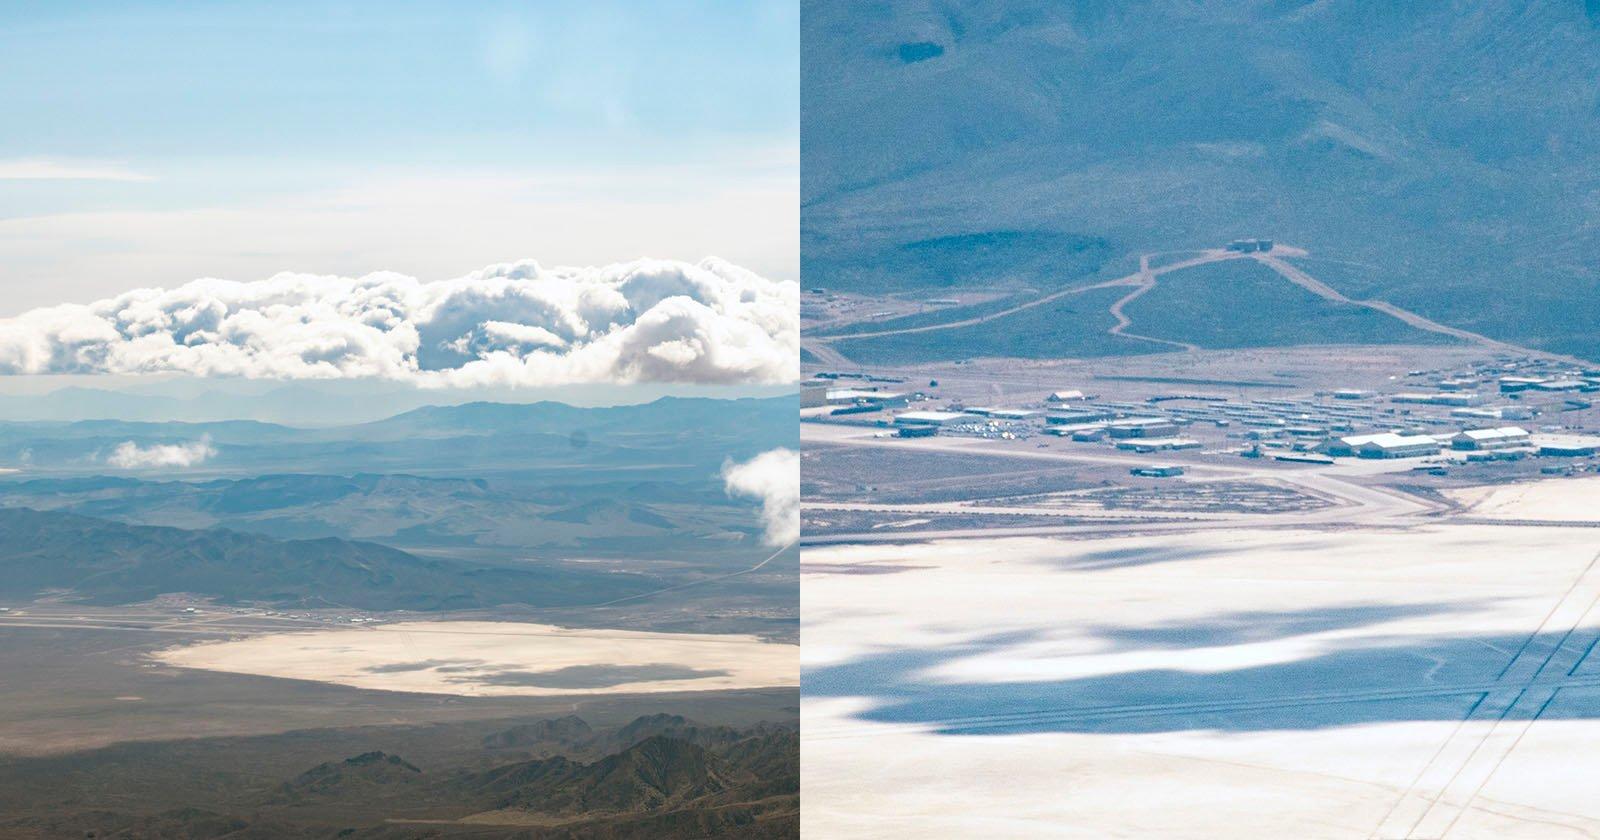 This Pilot Took Rare Aerial Photos of Area 51